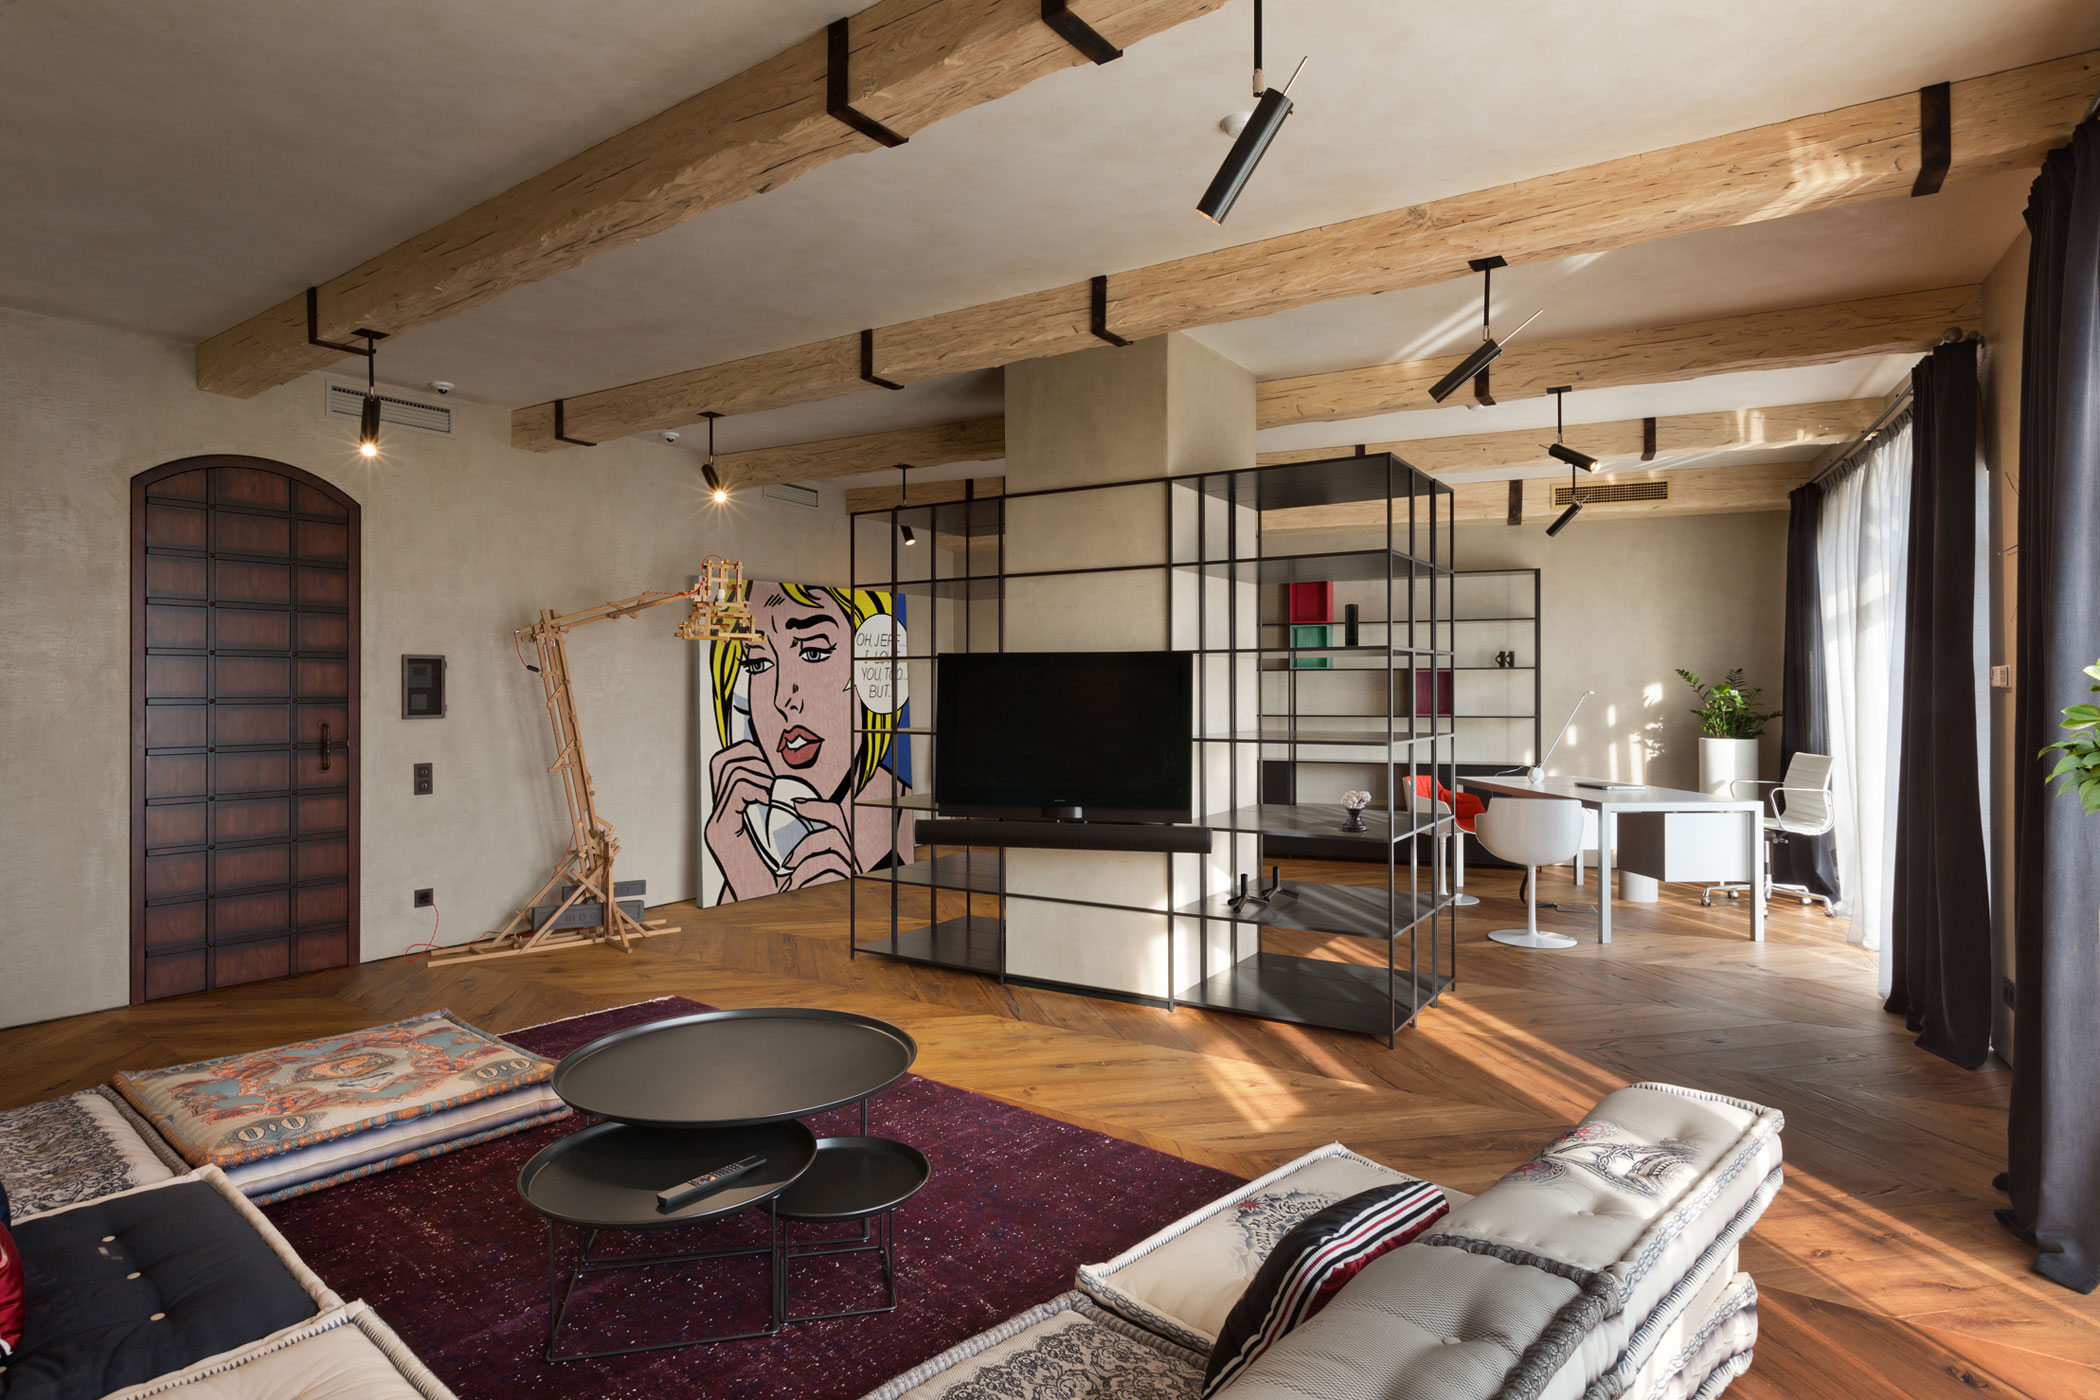 Italian Region Toscana Theme of BO Home near Kiev by Baraban+ design studio-04